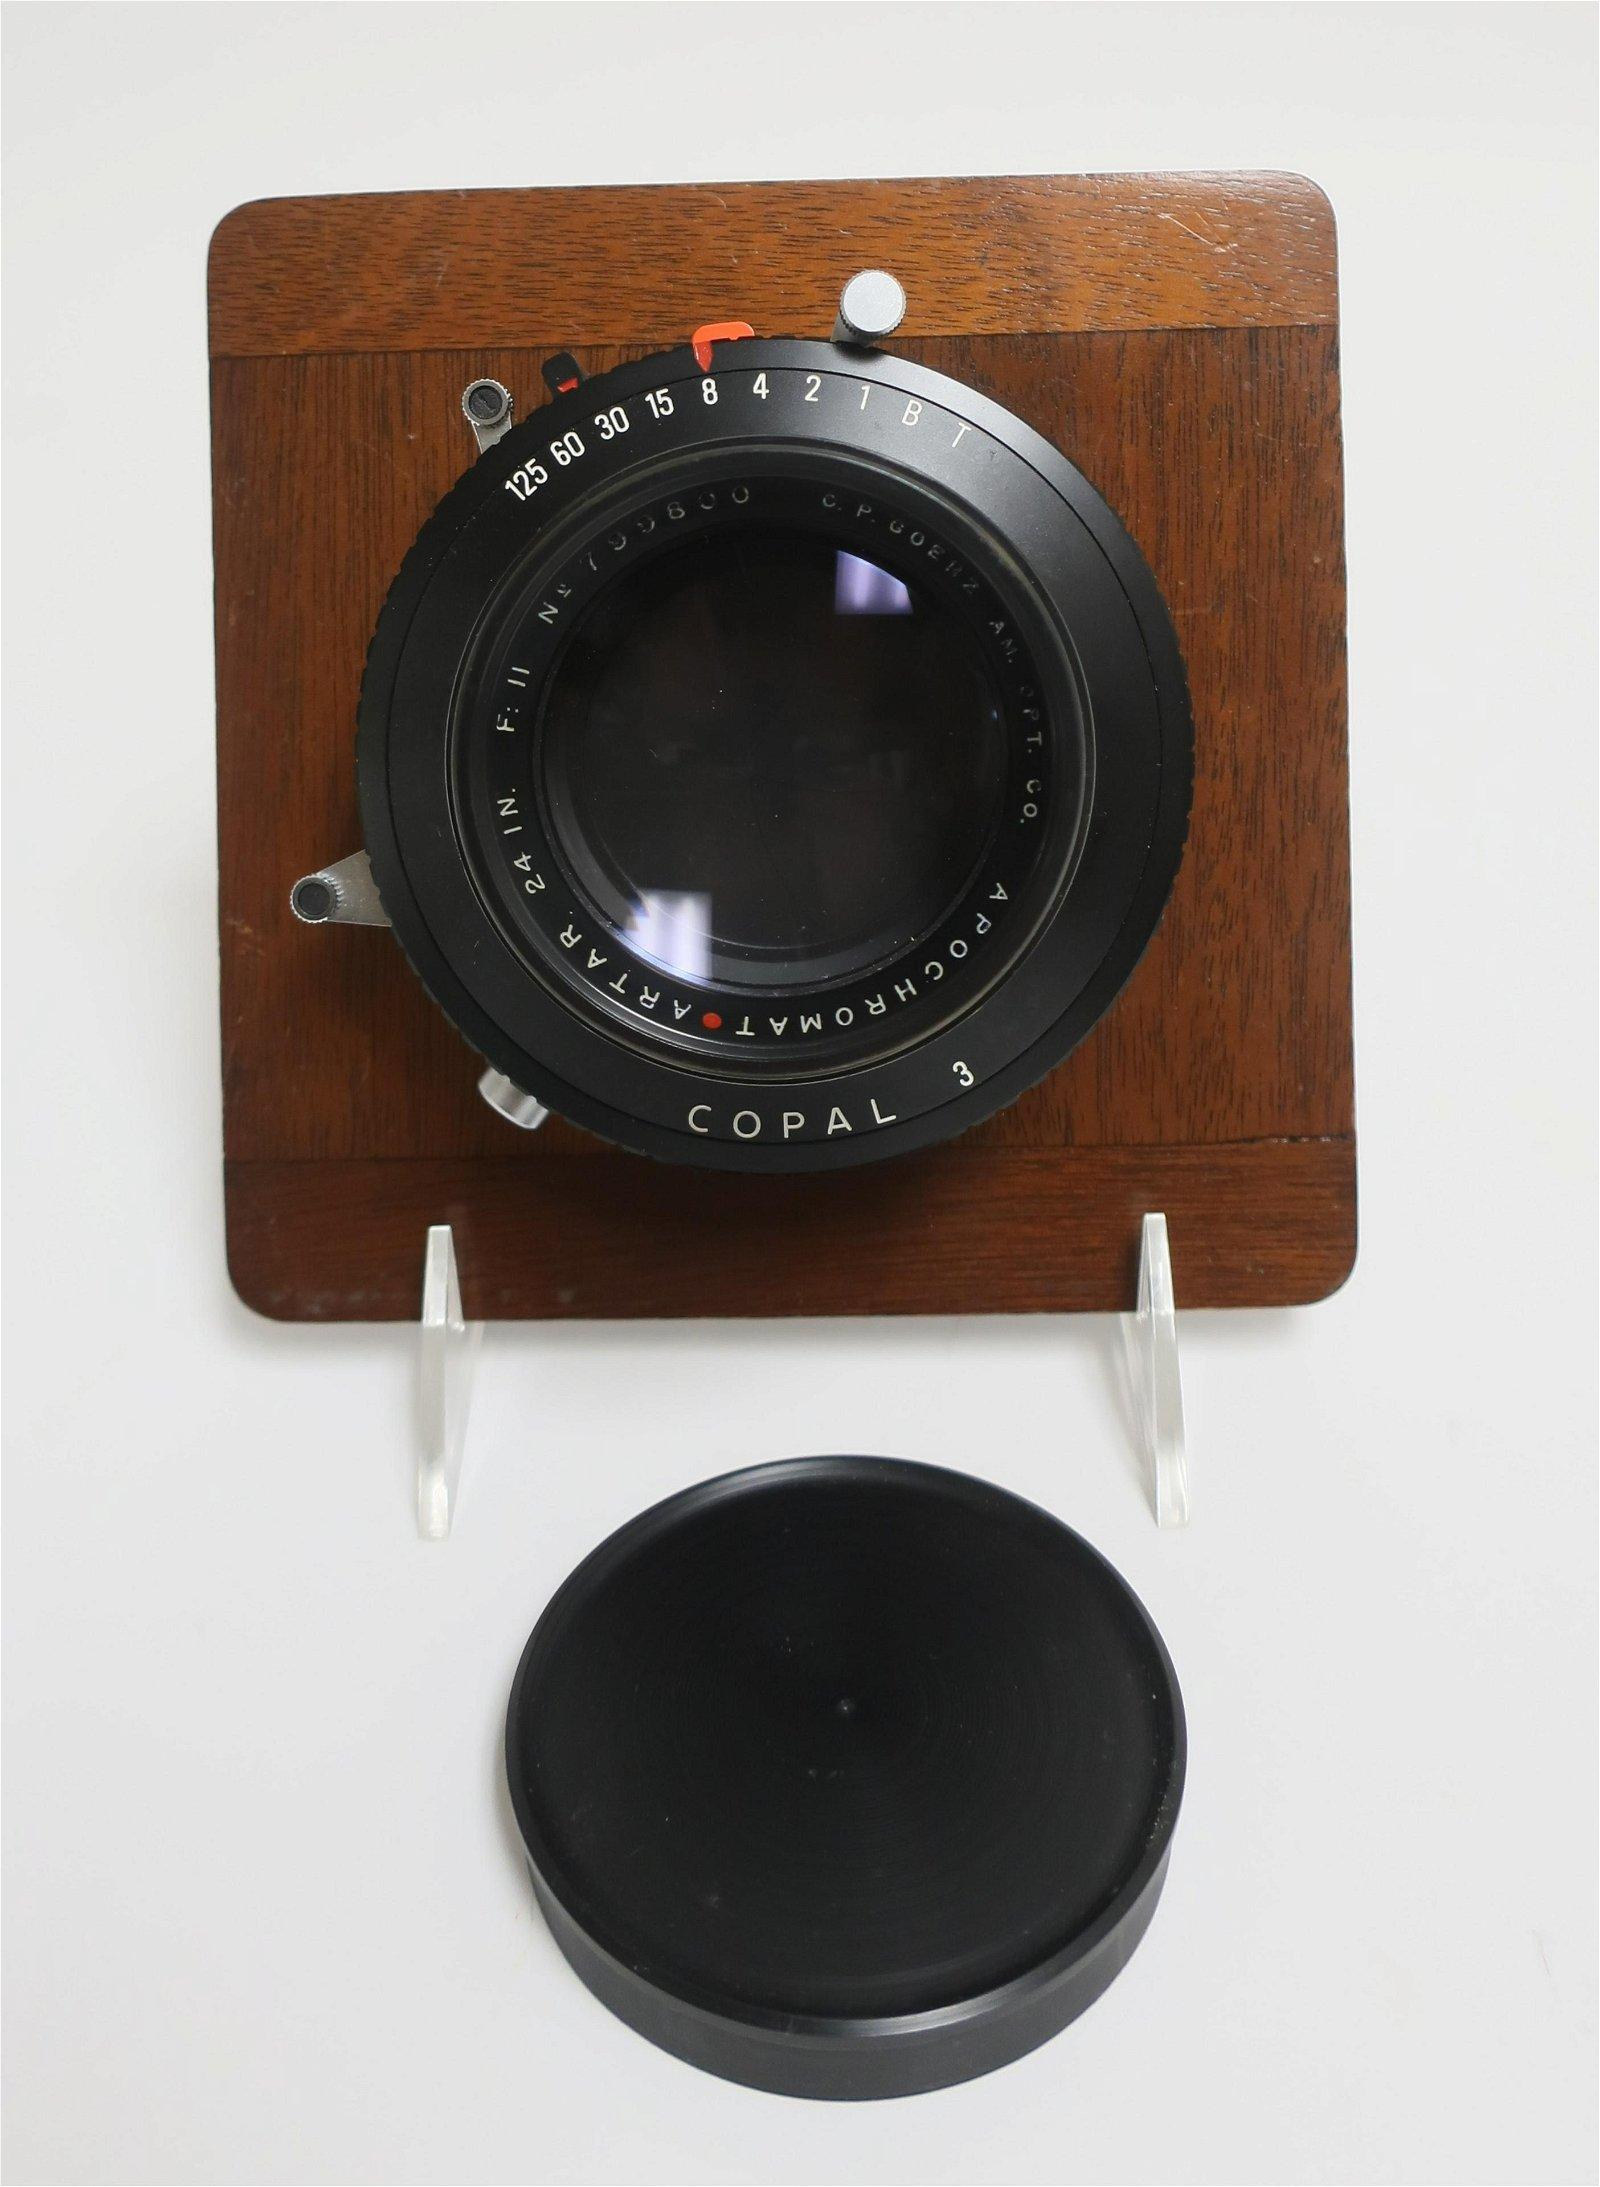 O.P. Goerz Large Format Camera Lens, f11